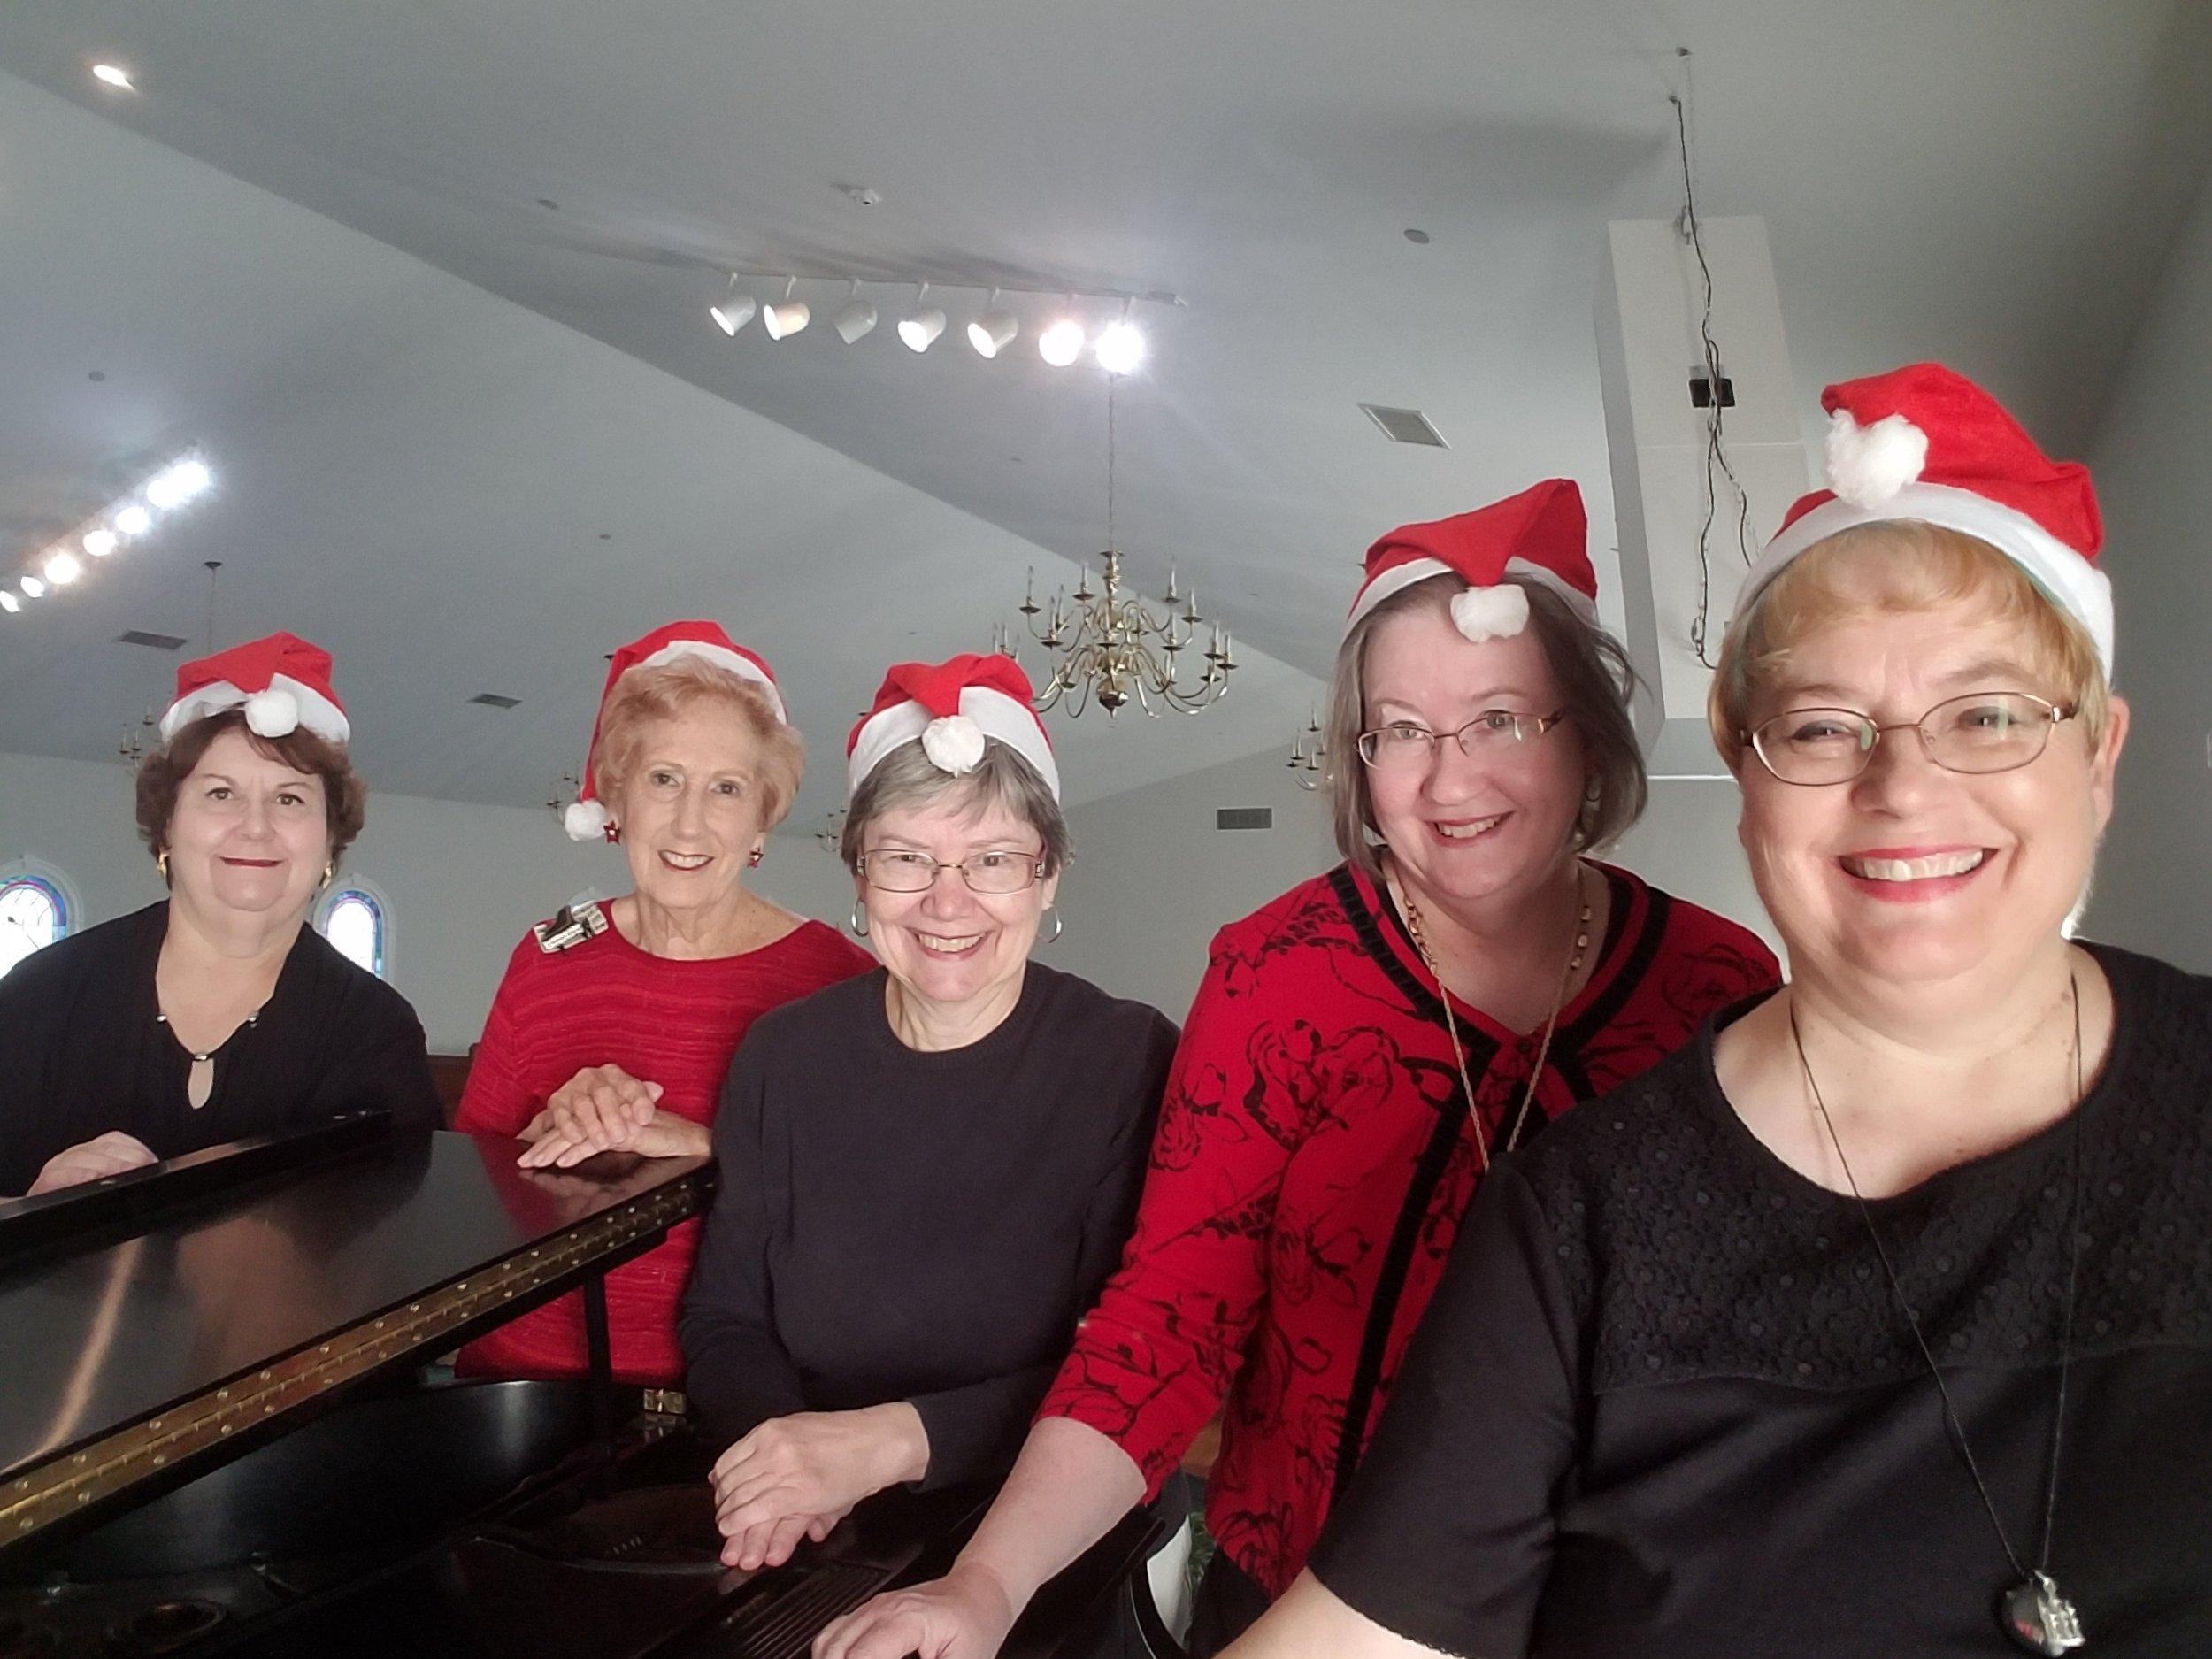 Copy of Keyboards at Christmas